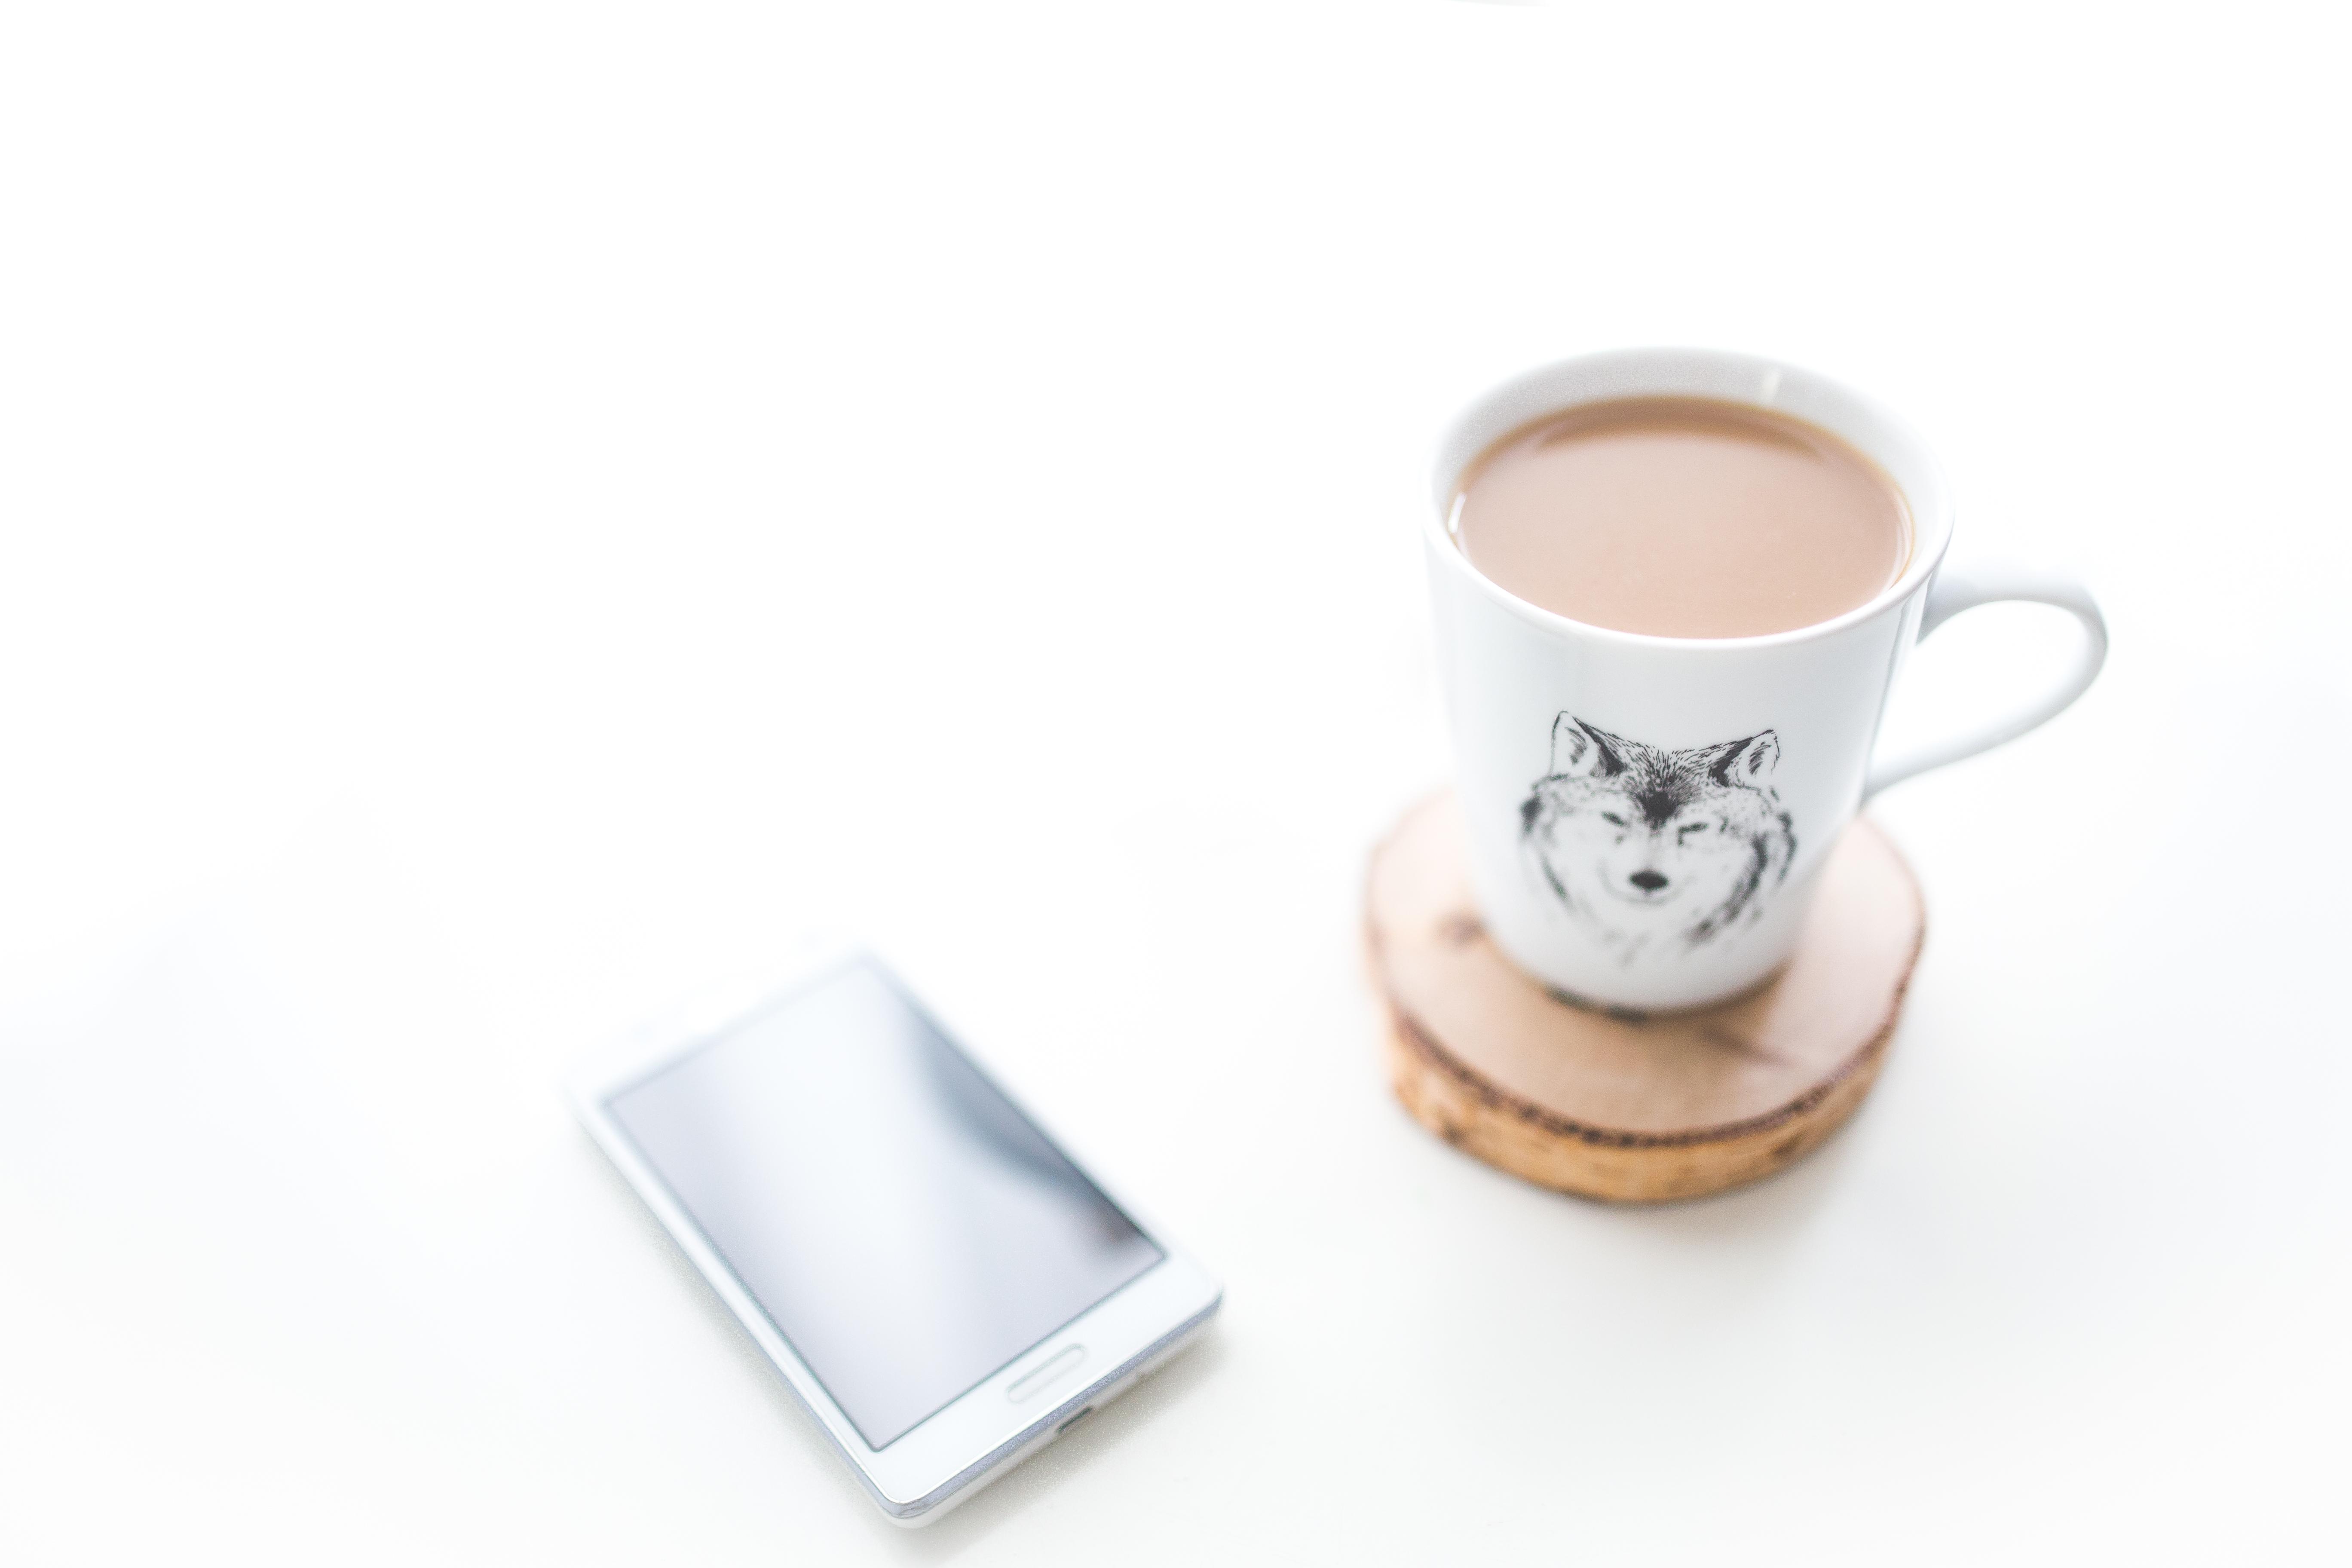 Desk Smartphone Mobile Hand Coffee White Morning Cup Phone Drink Espresso Mug Device Caffeine